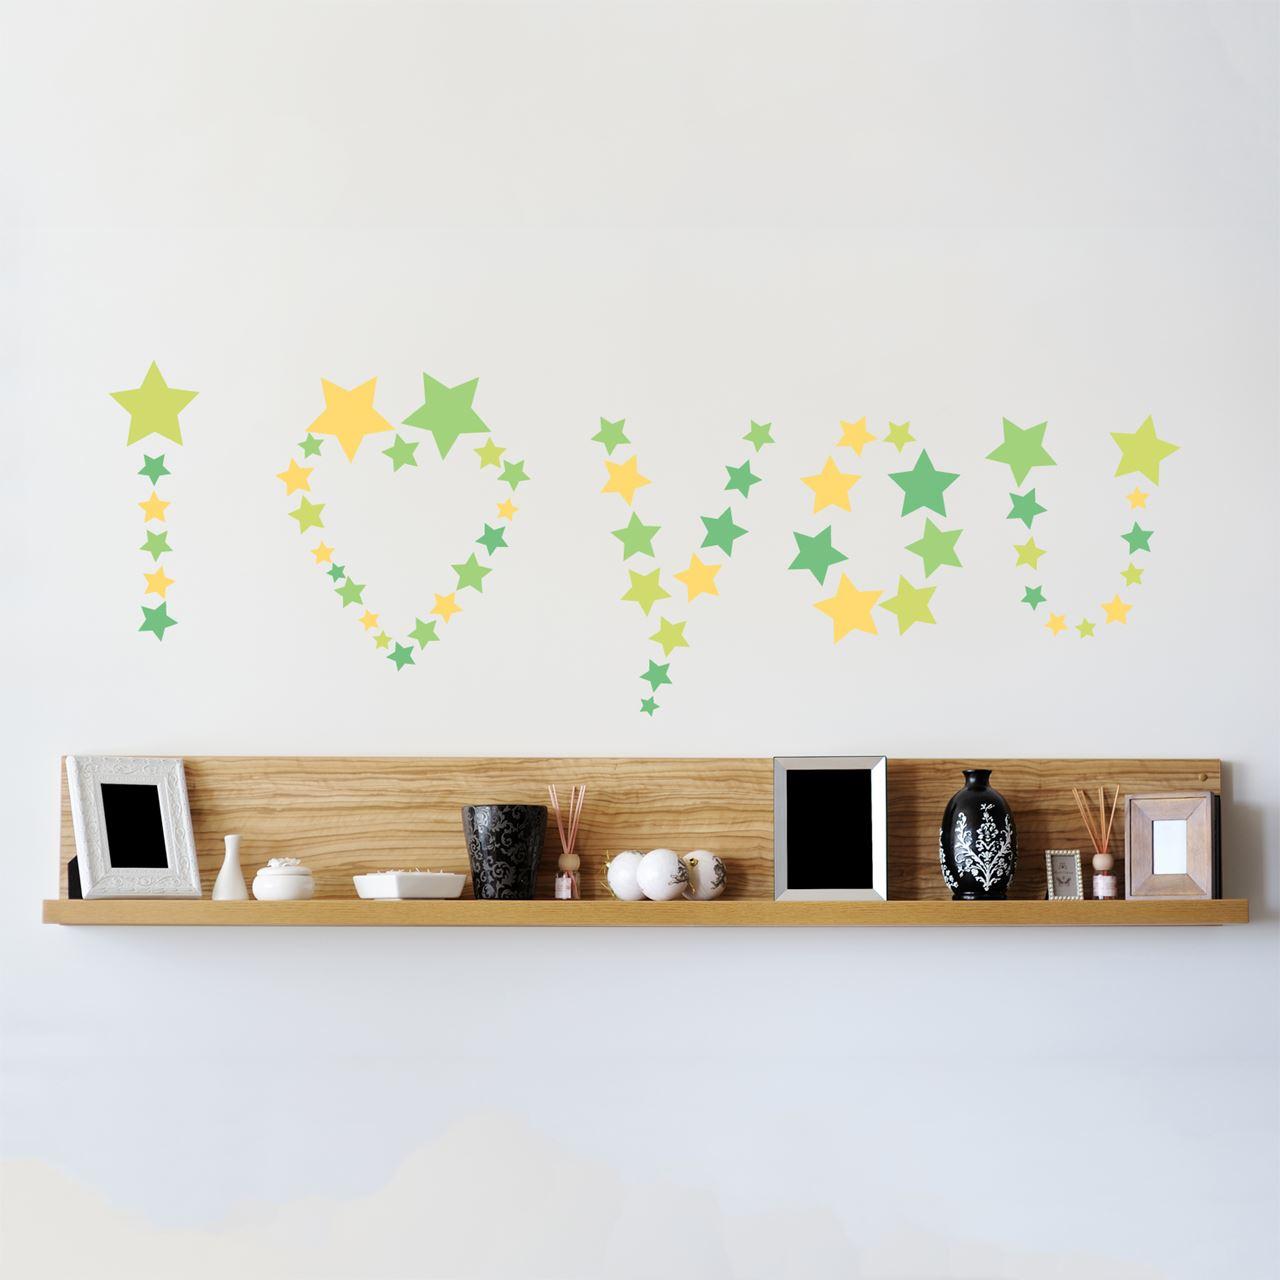 Channeldistribution Walplus Home Decoration Sticker Stars